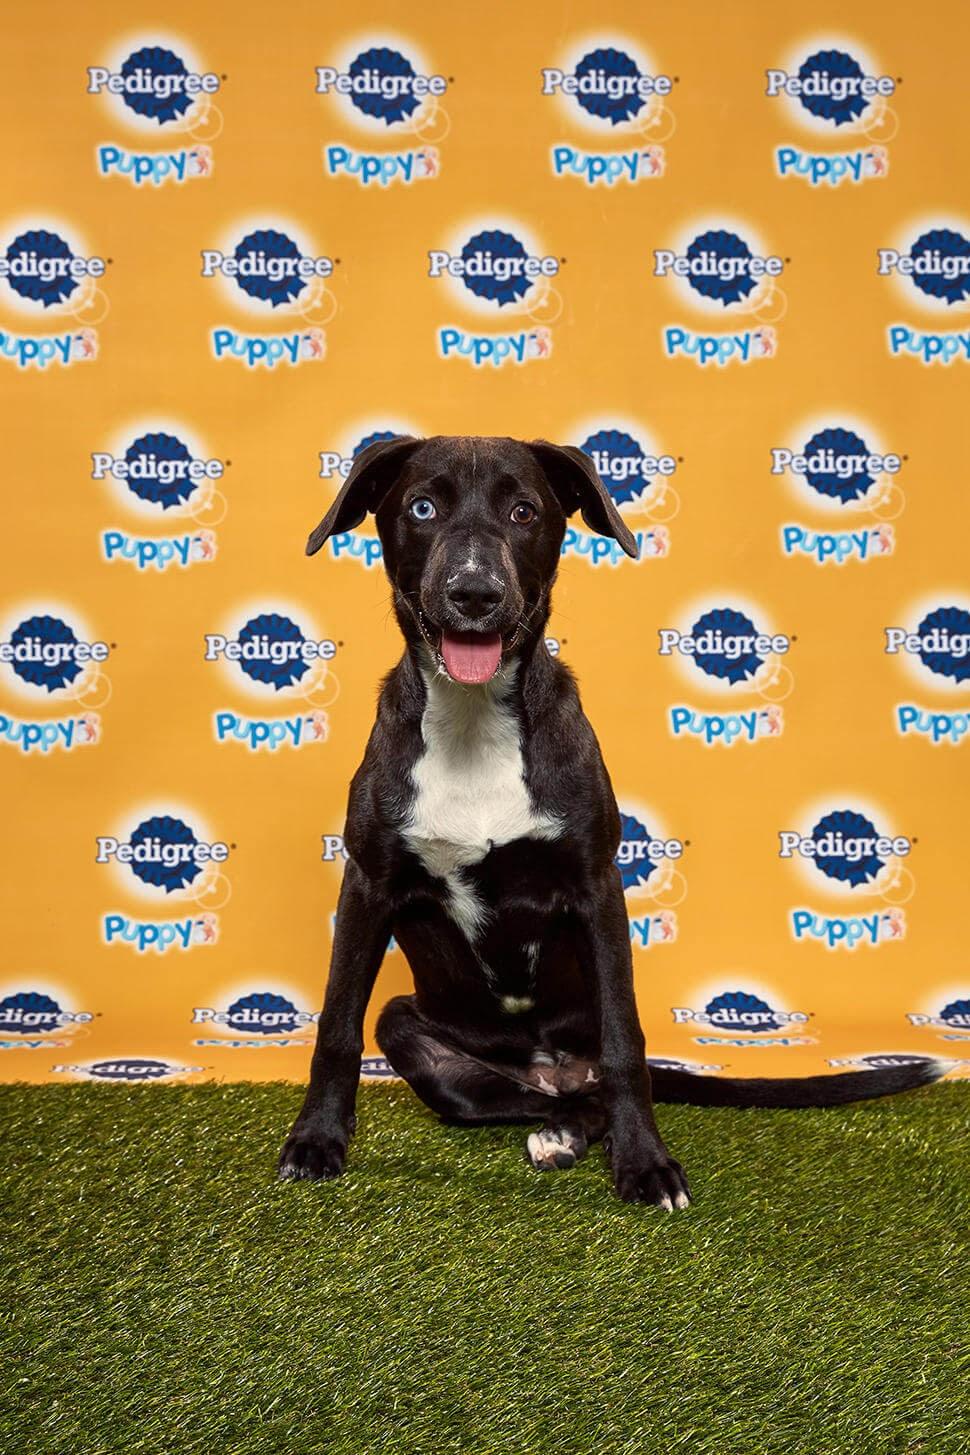 Ferris dog - Animal Planet